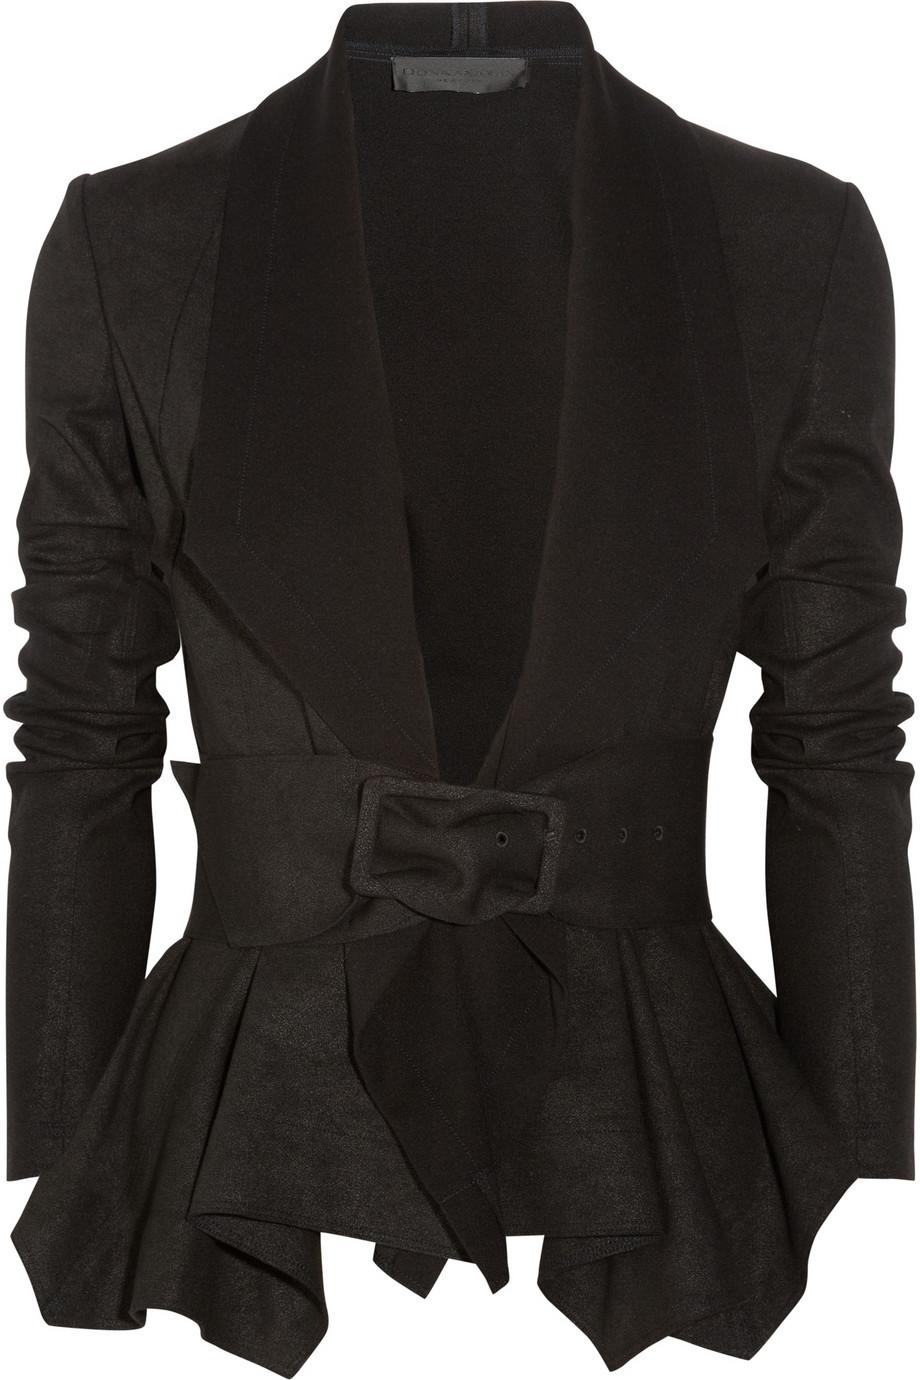 Donna karan Draped Coated Jersey Jacket in Gray